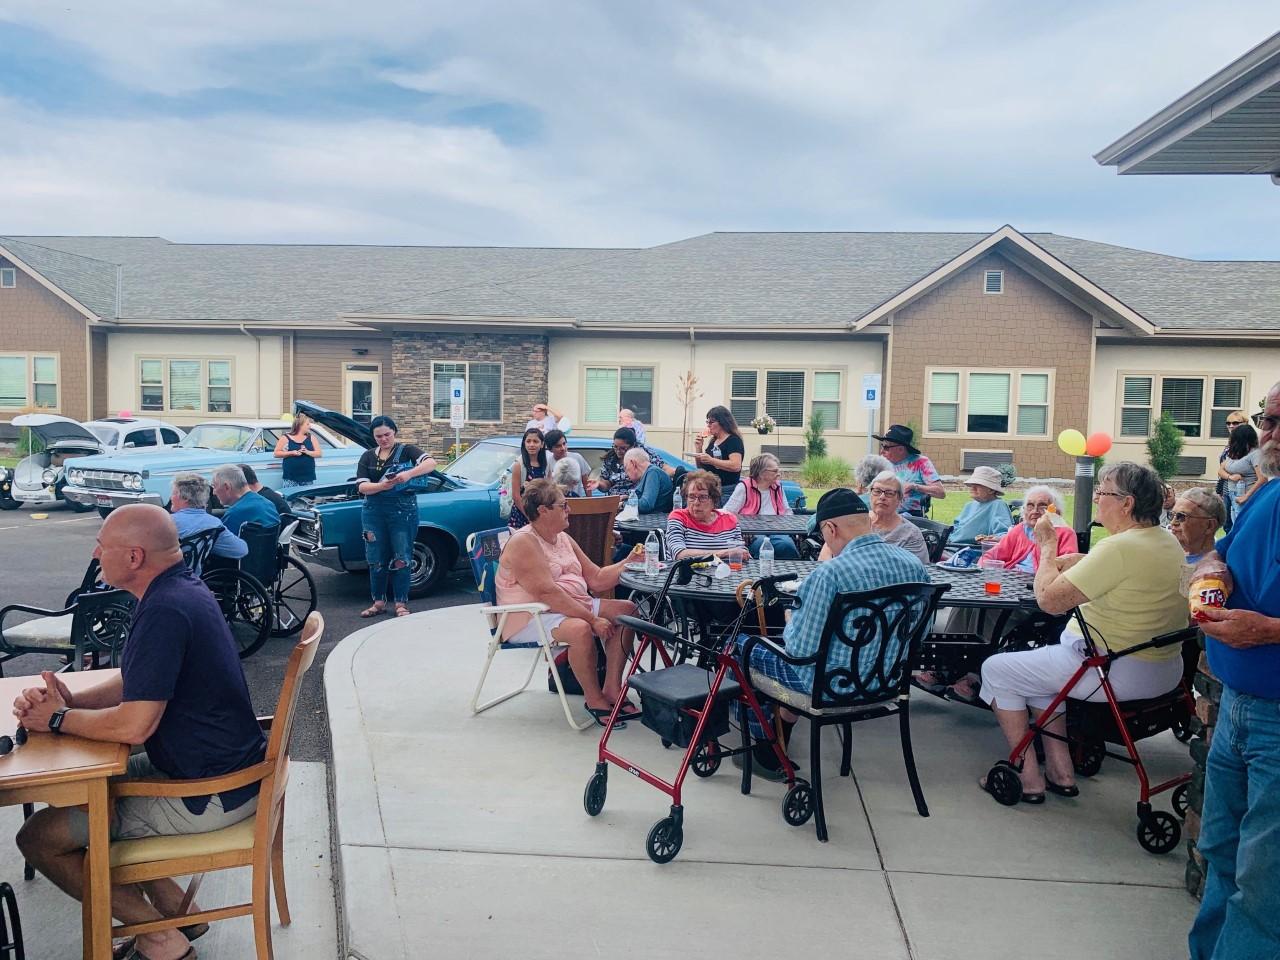 Idaho's Top Rated Local® Senior Living Communities Award Winner: The Canyons Retirement Community